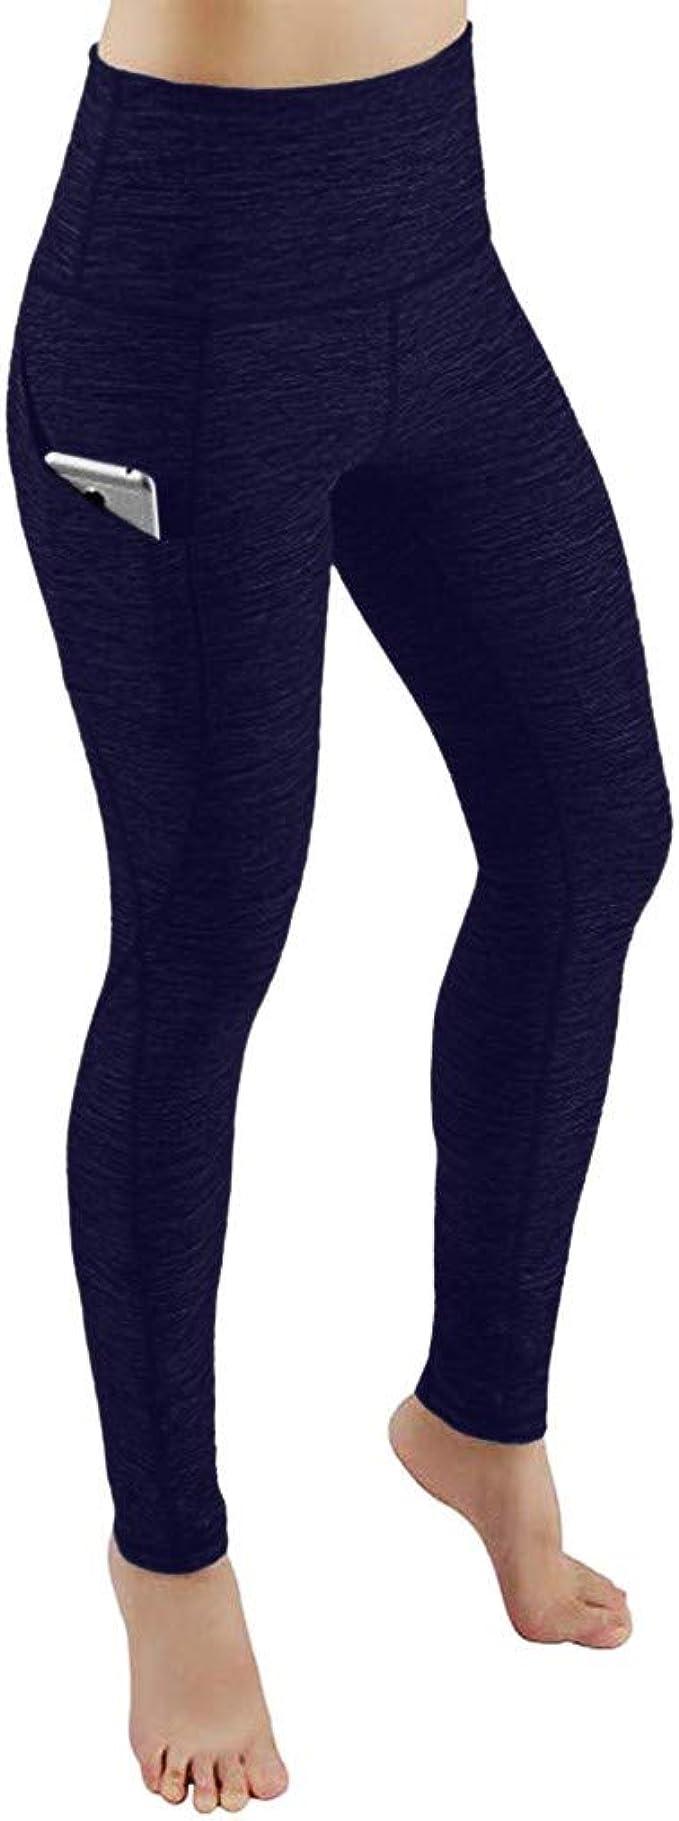 ZARLLE Leggings Deporte Mujer Pantalon Elastico Mujer Mallas de ...